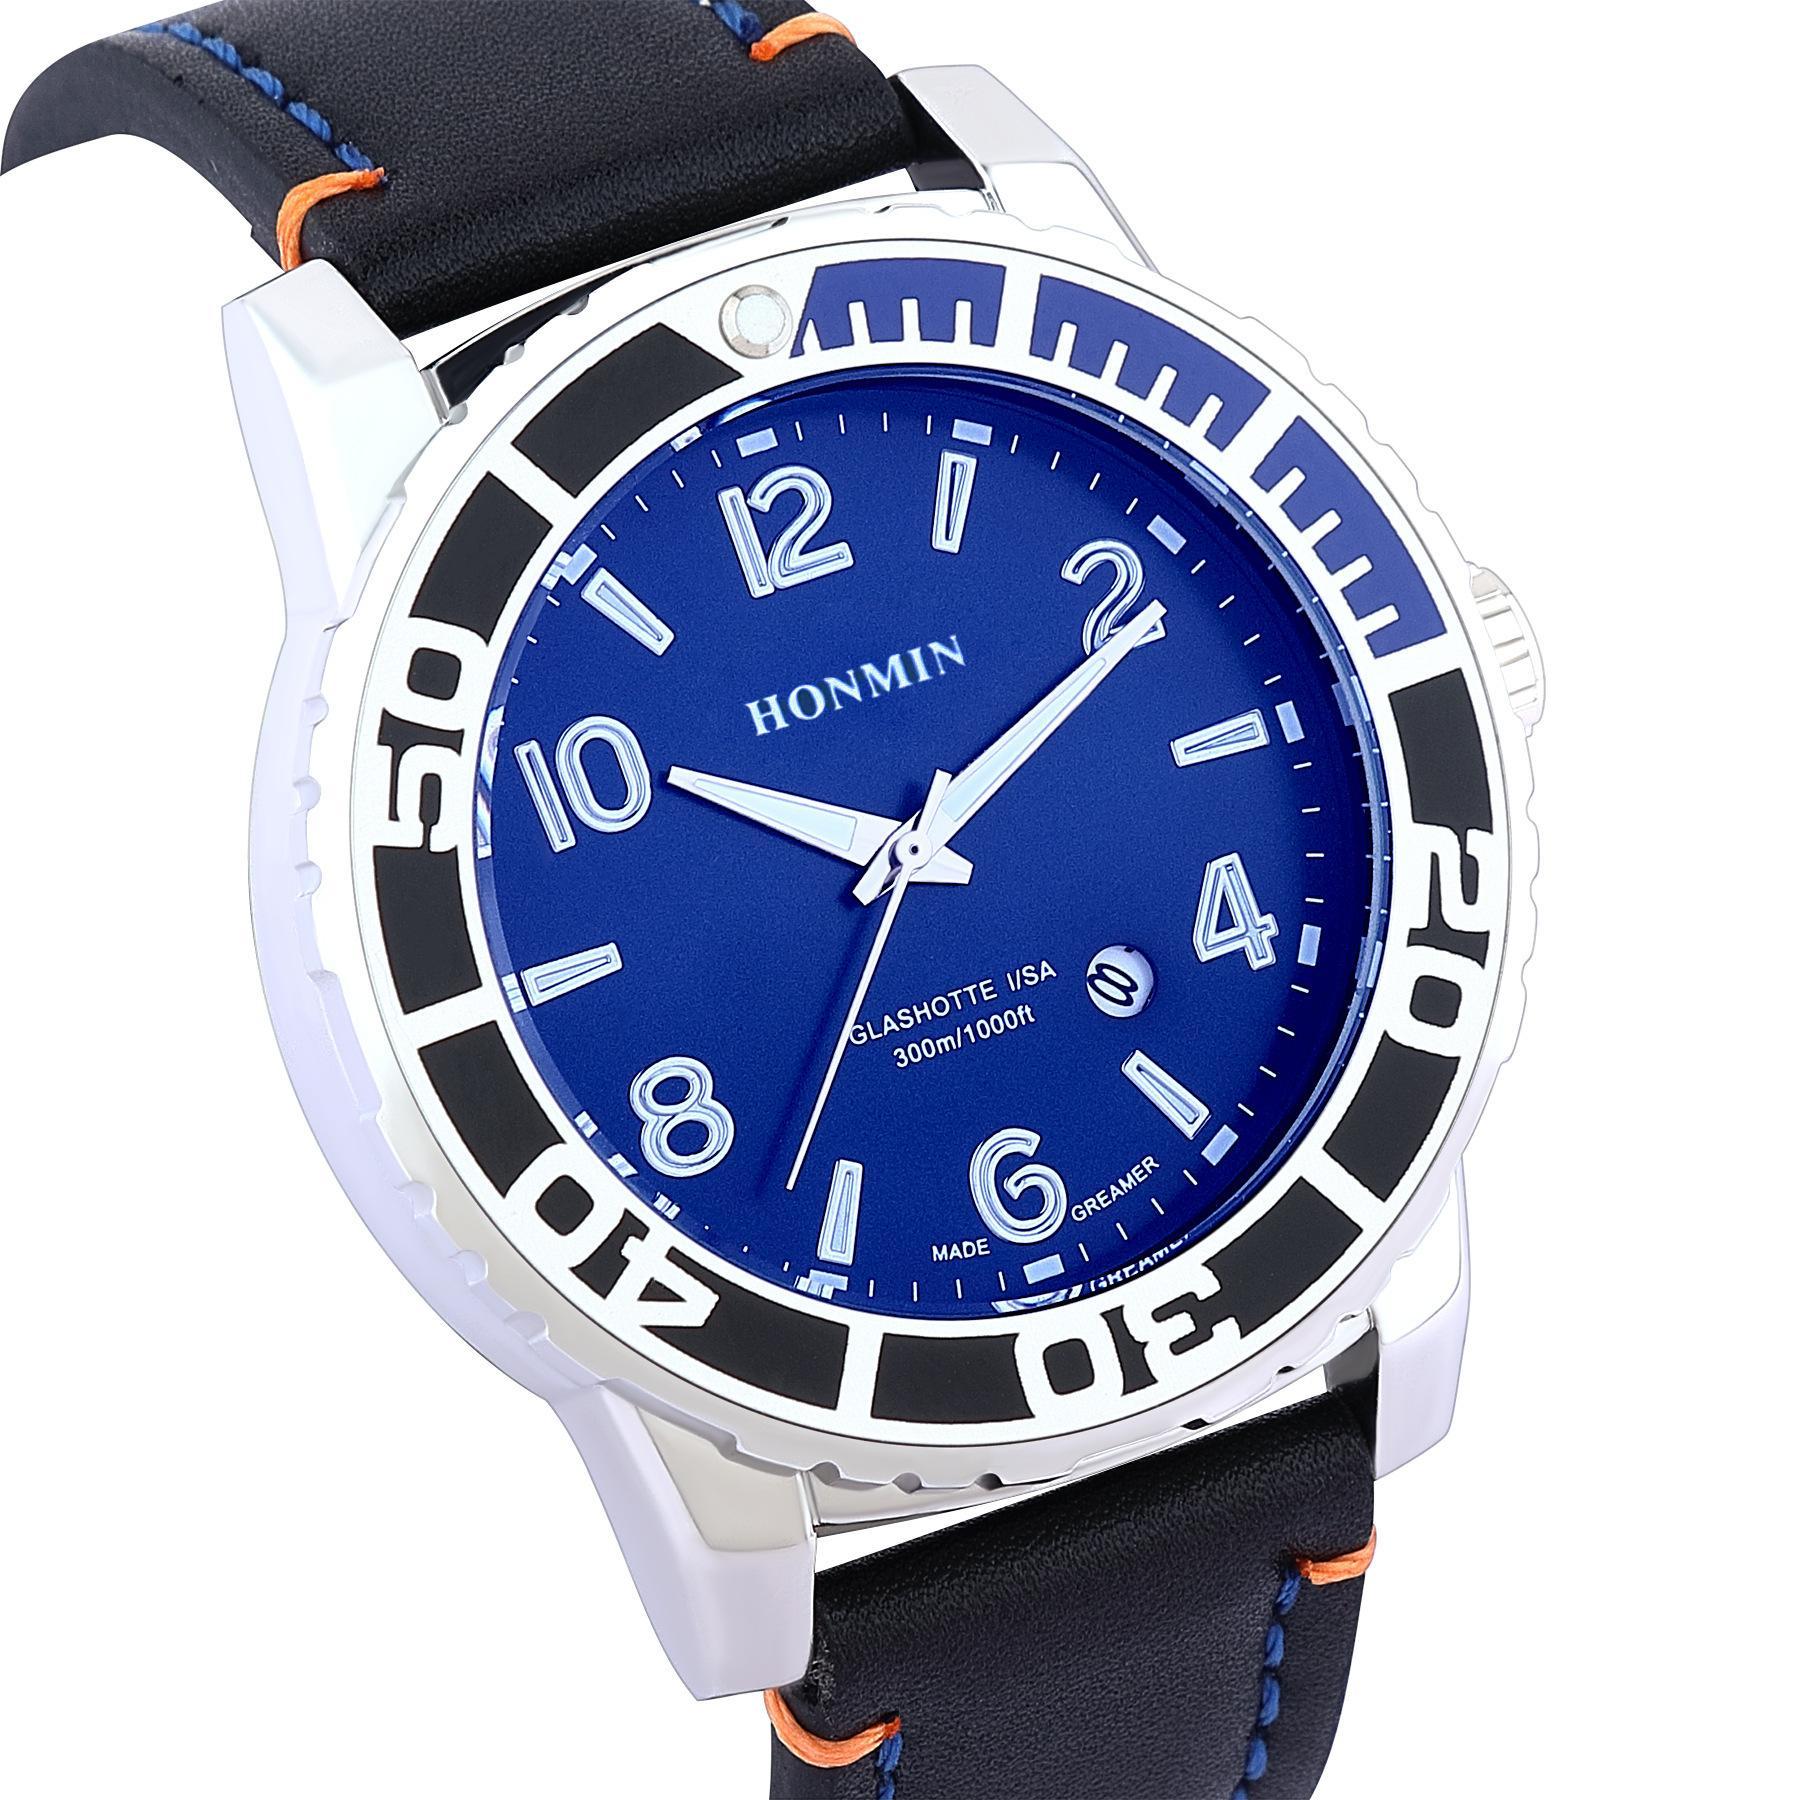 Honmin Men's Watch New Belt Casual Fashion Fashion Impermeable Luminoso Reloj de cuarzo